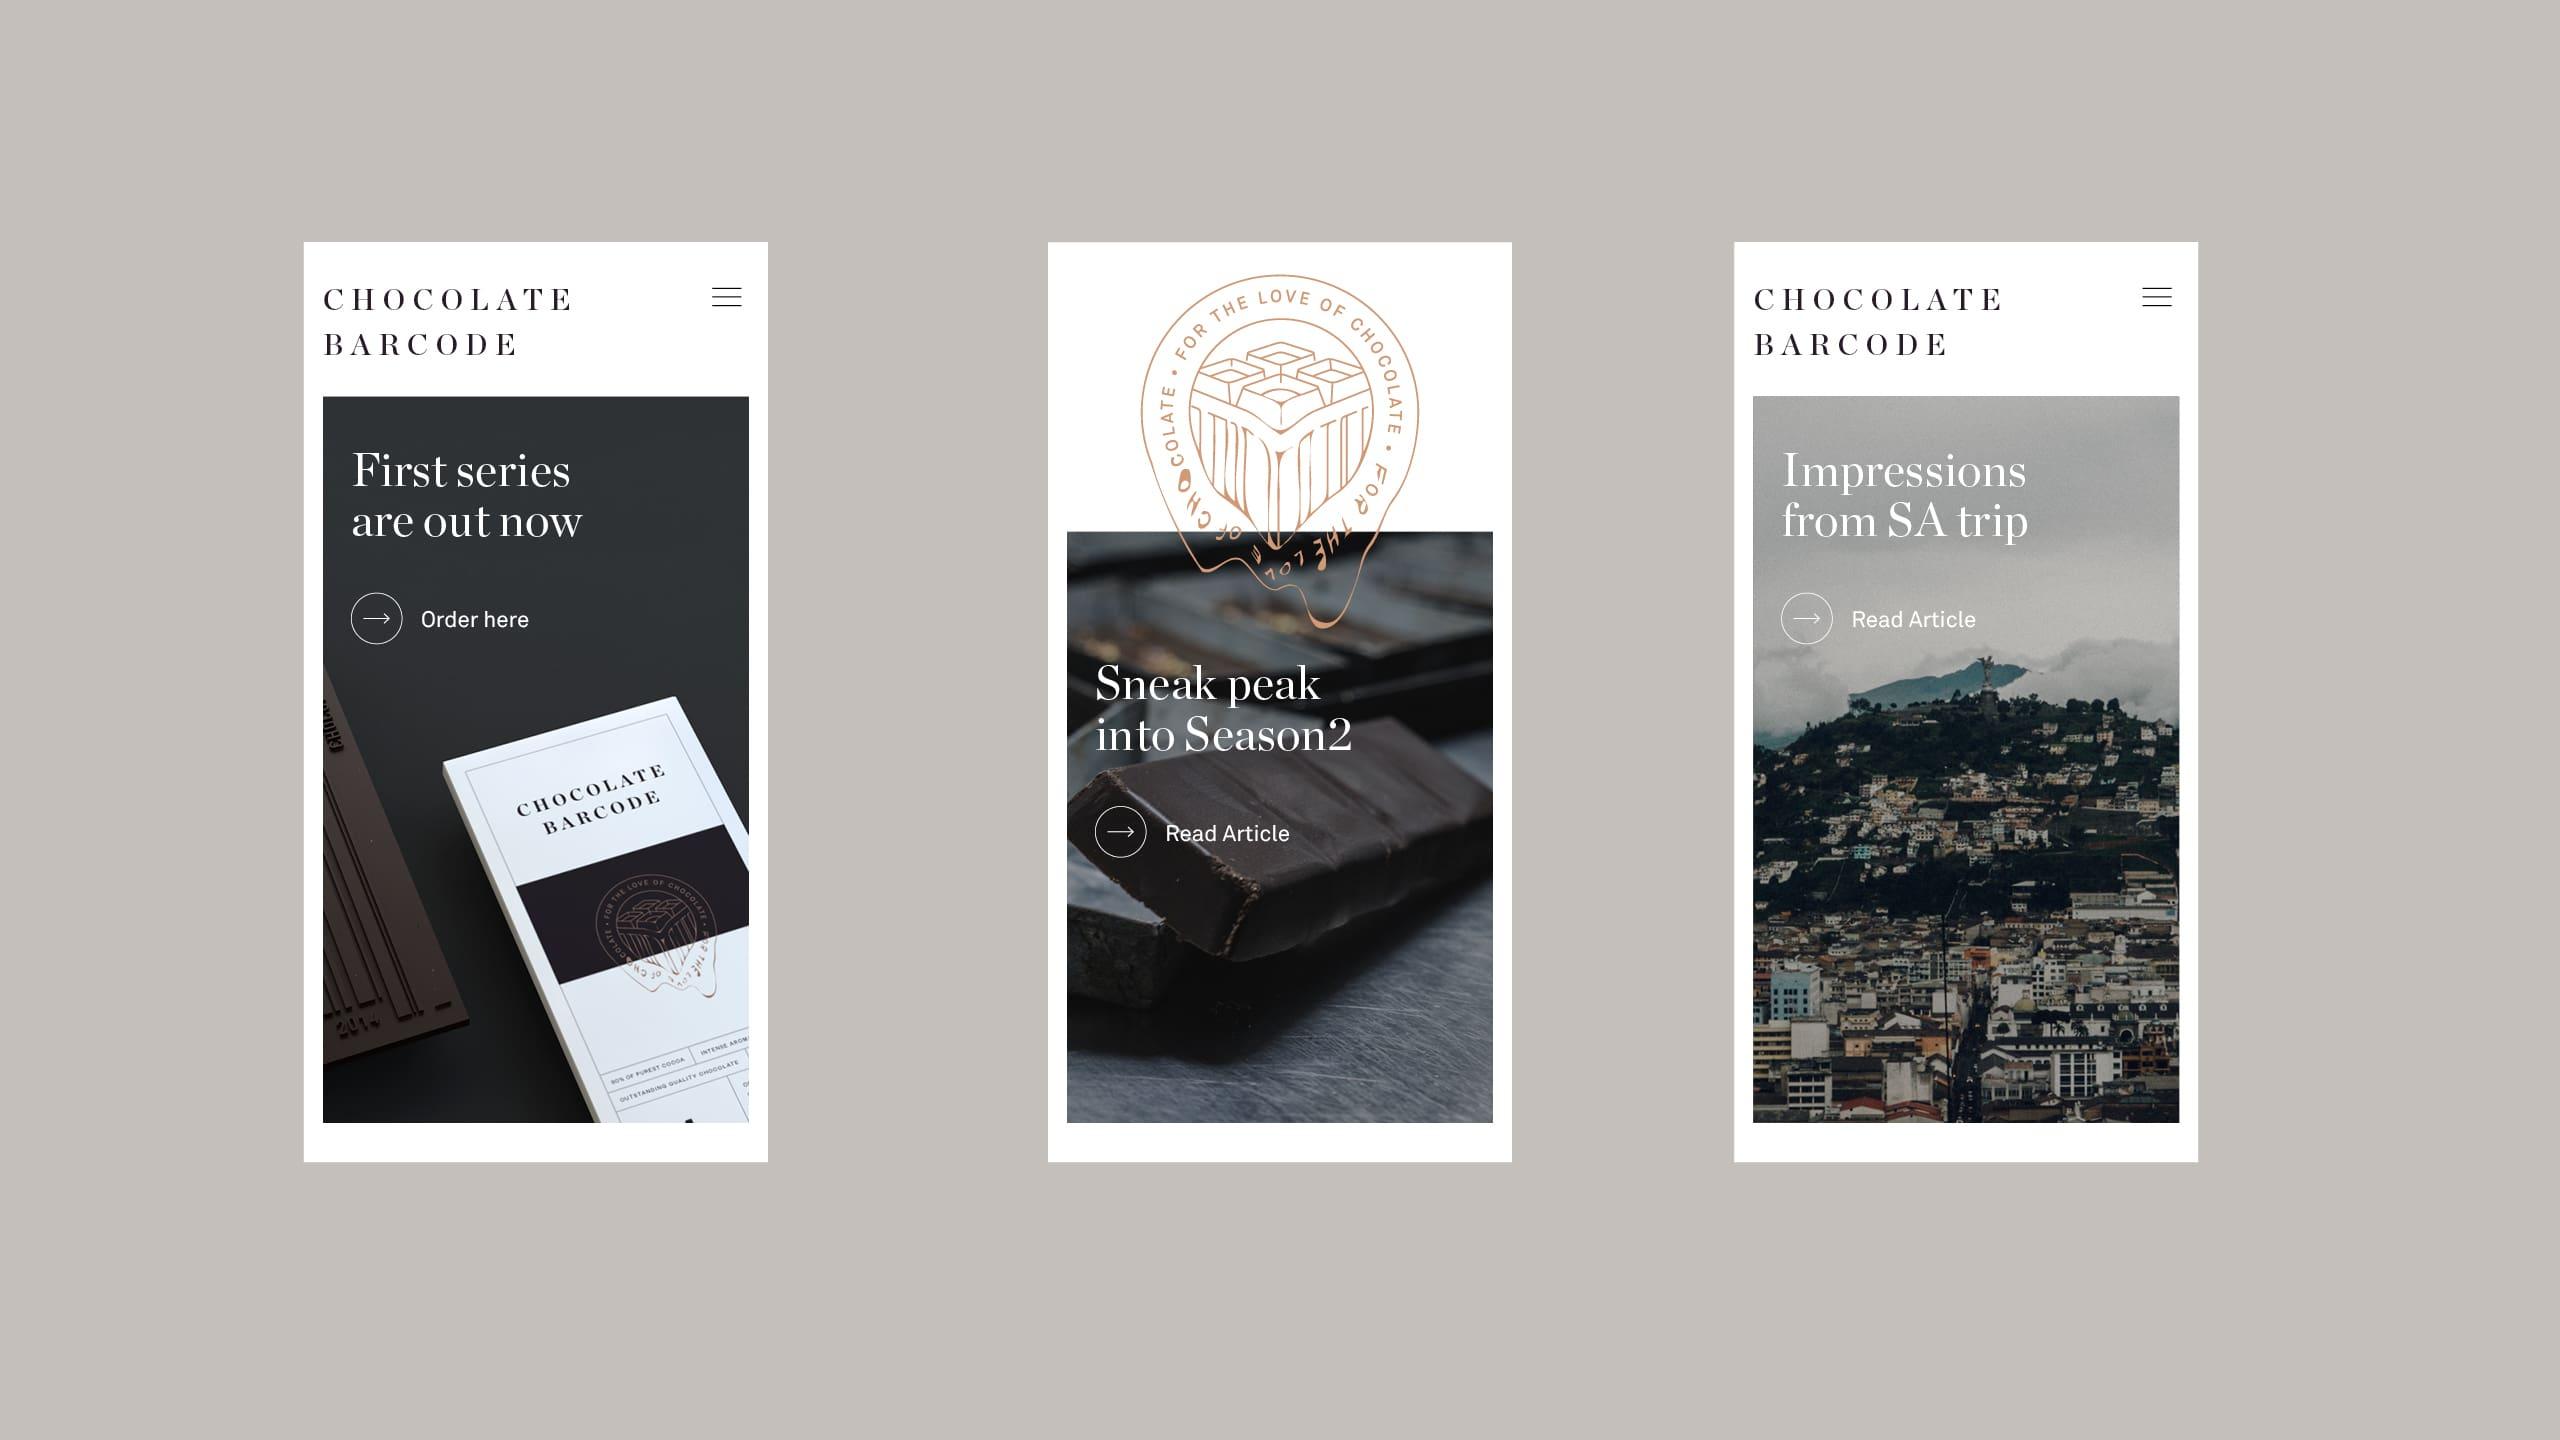 mantik-digital-branding-development-agency-chocolate-packaging-webdesign-design-17-min